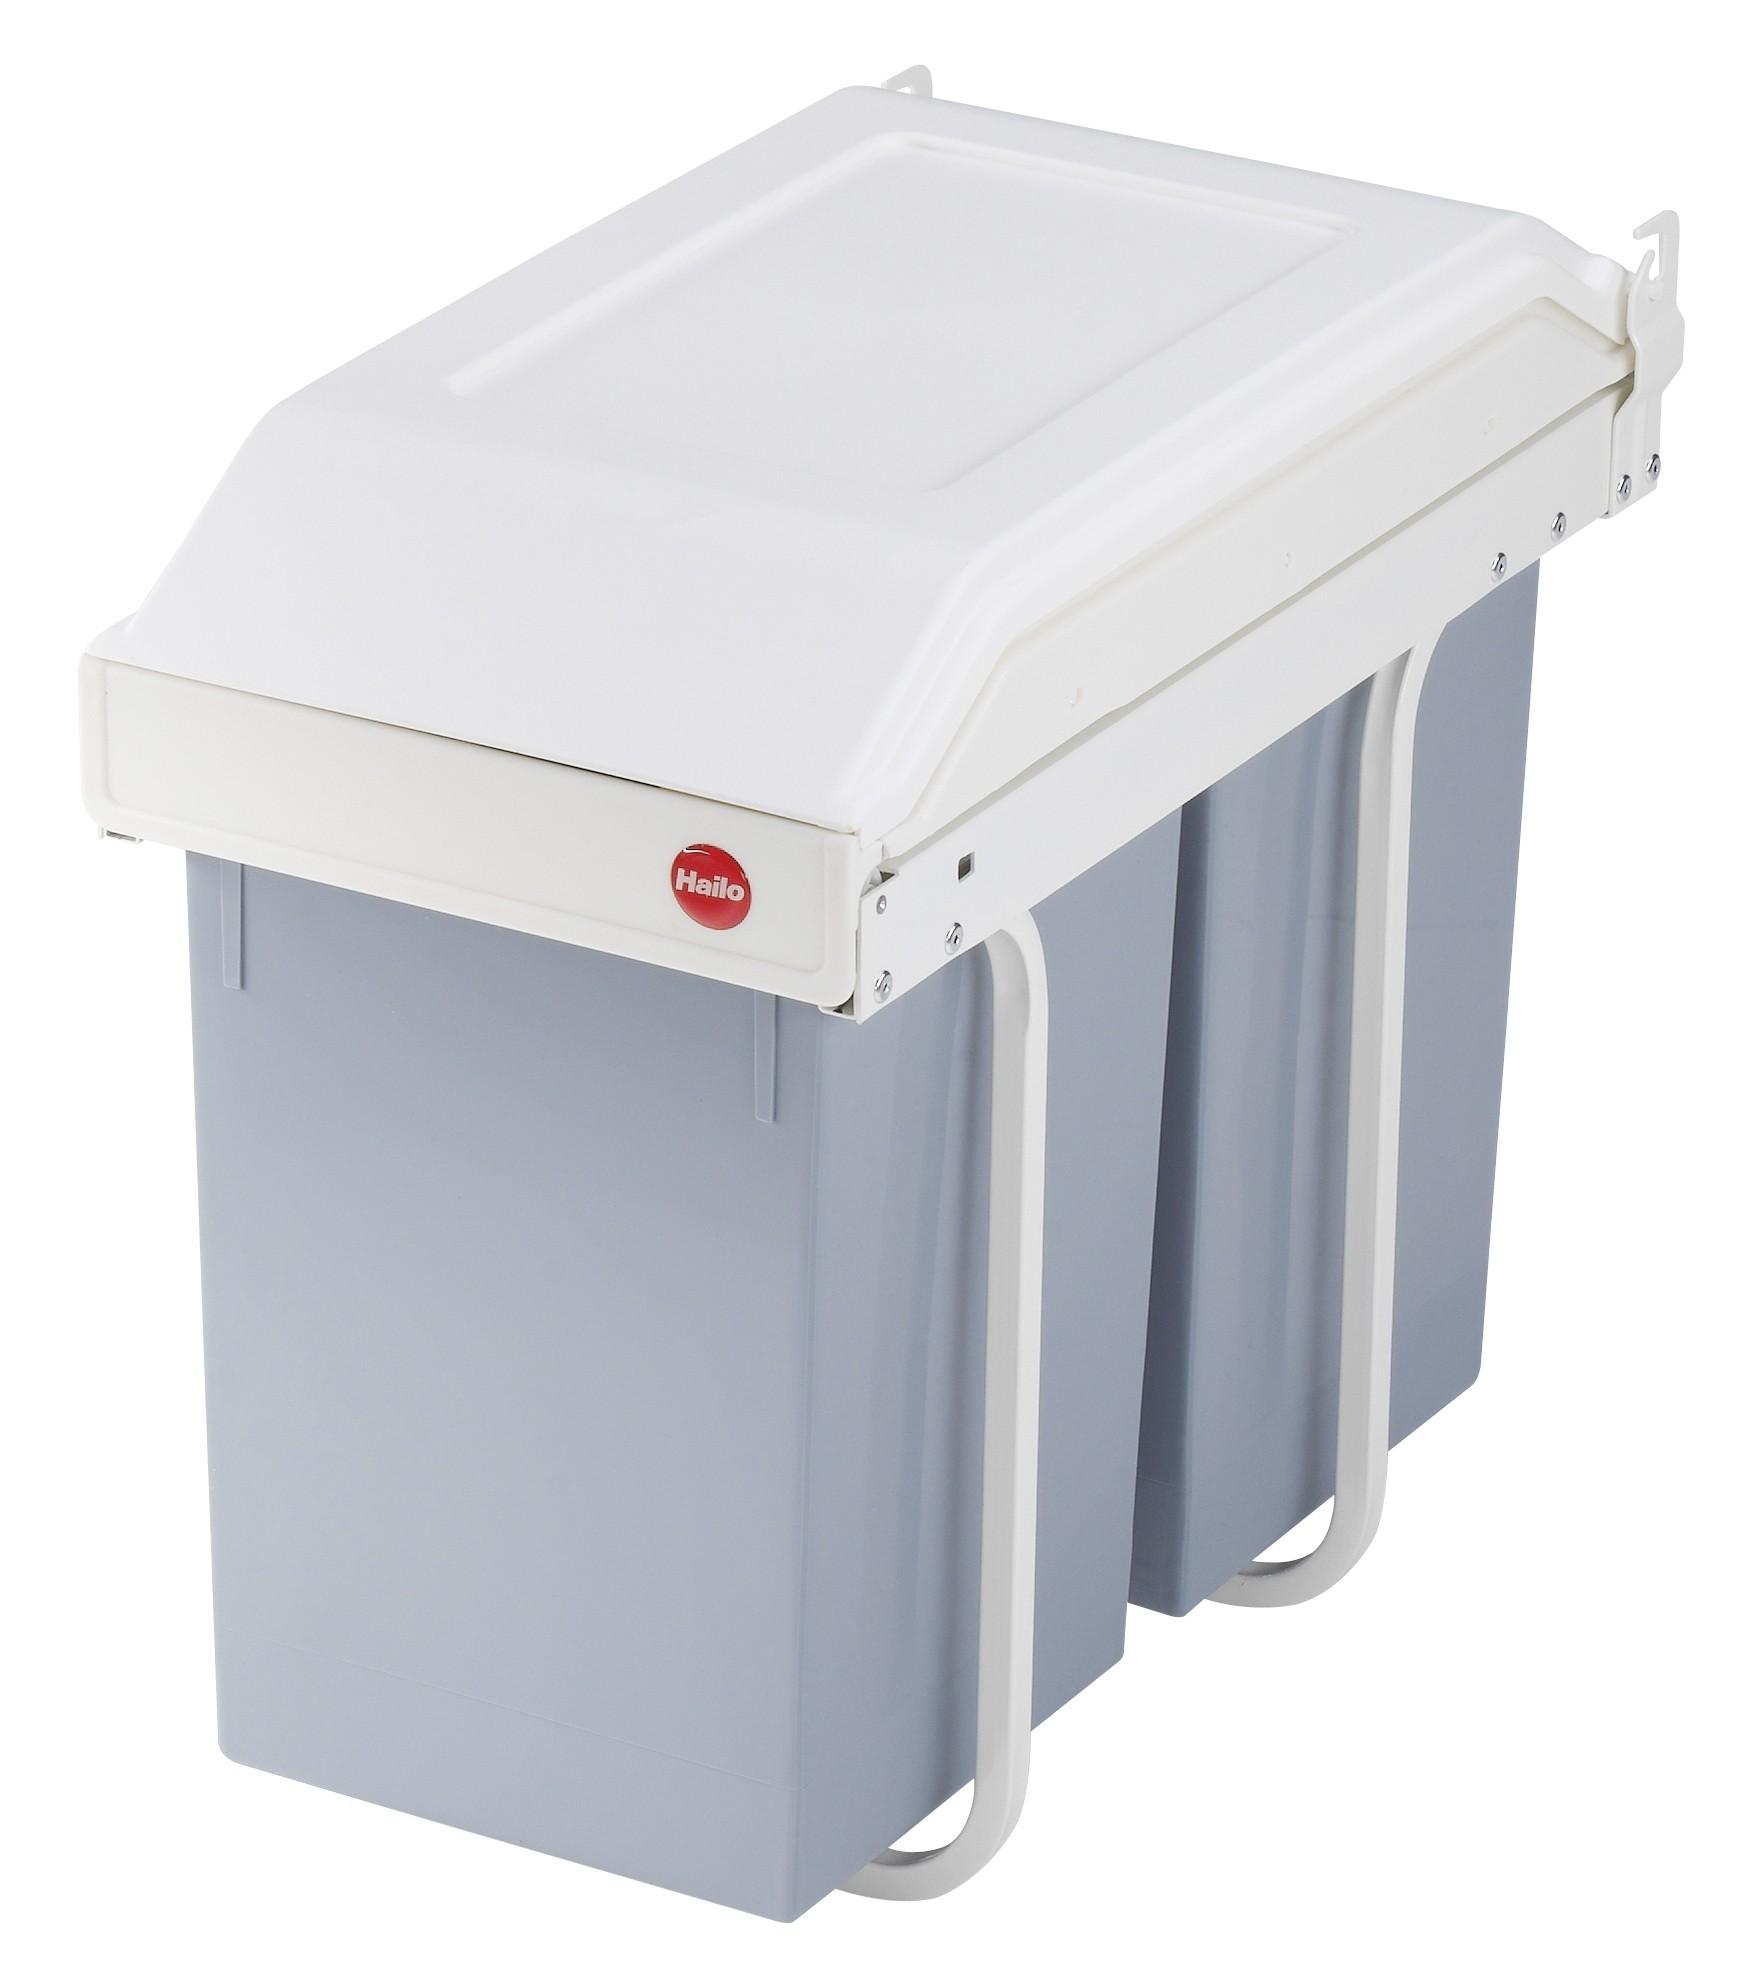 Hailo Mutli-Box Duo L, Einbau-Mülltrennungs-System, 2 x 14 l herausnehmbare Inneneimer